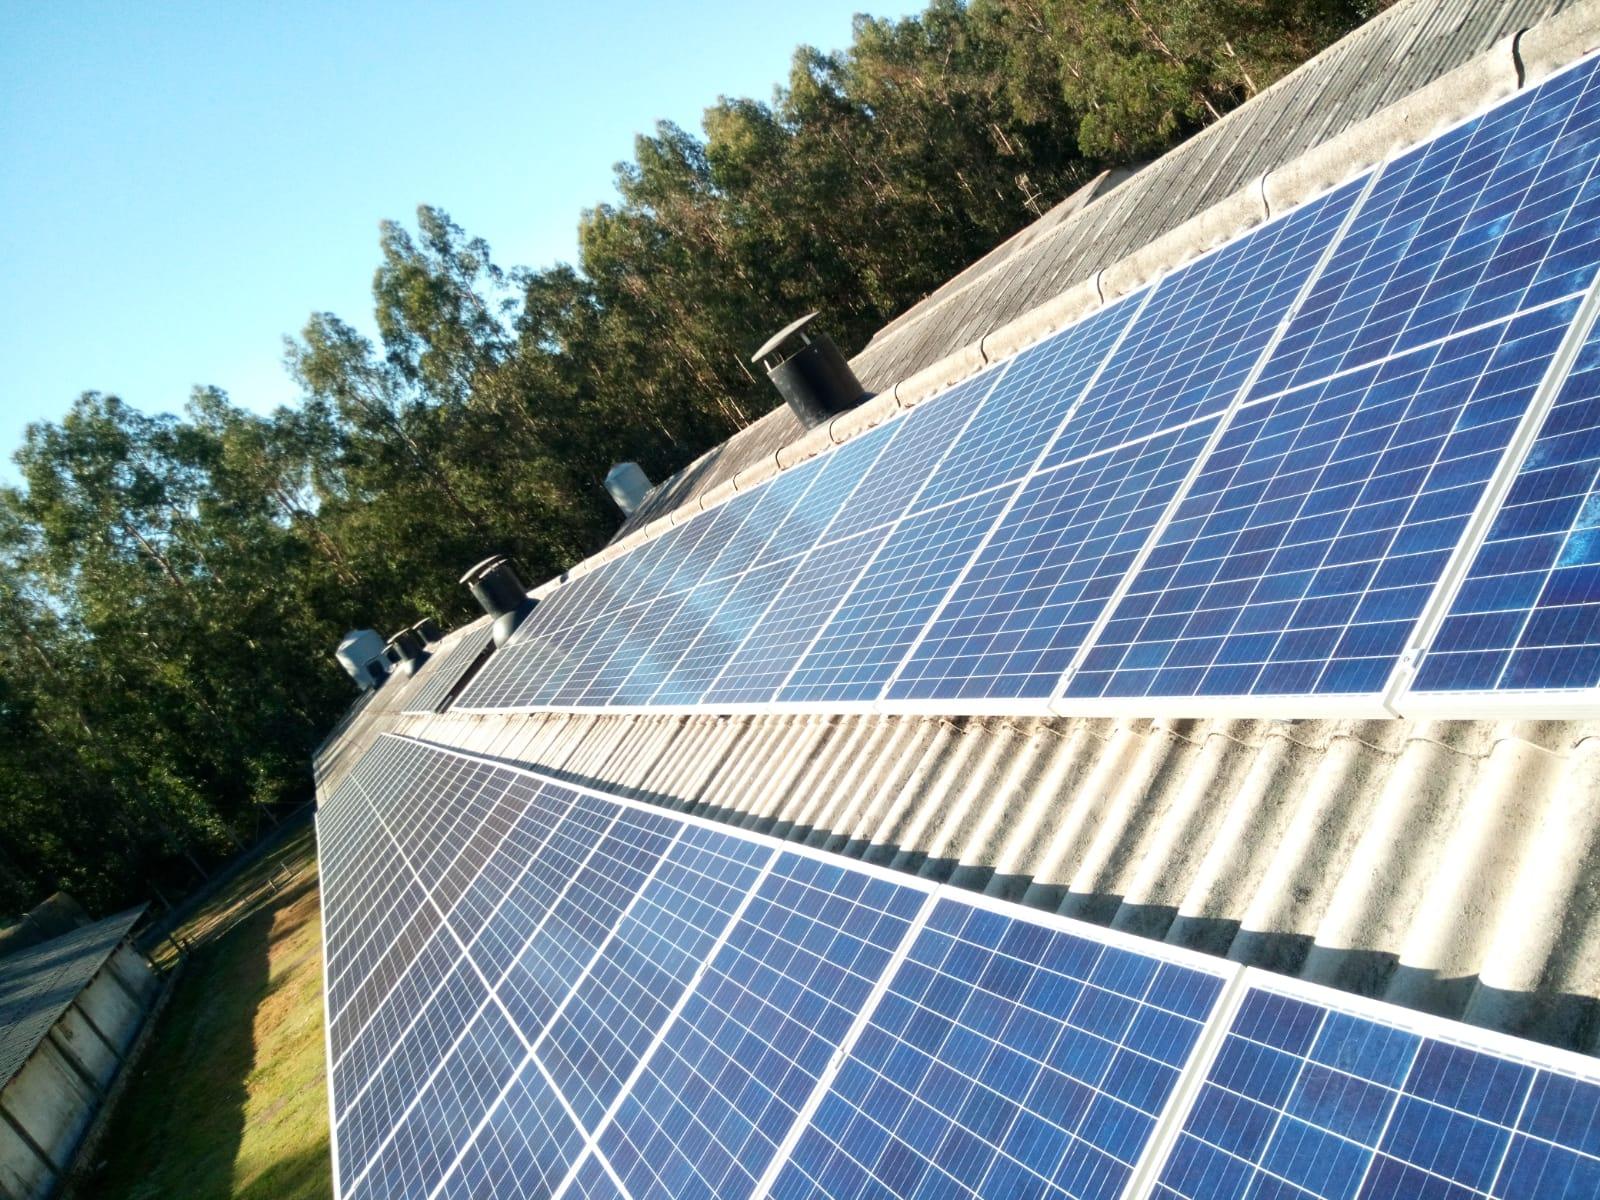 Fotovoltaica granja en galicia